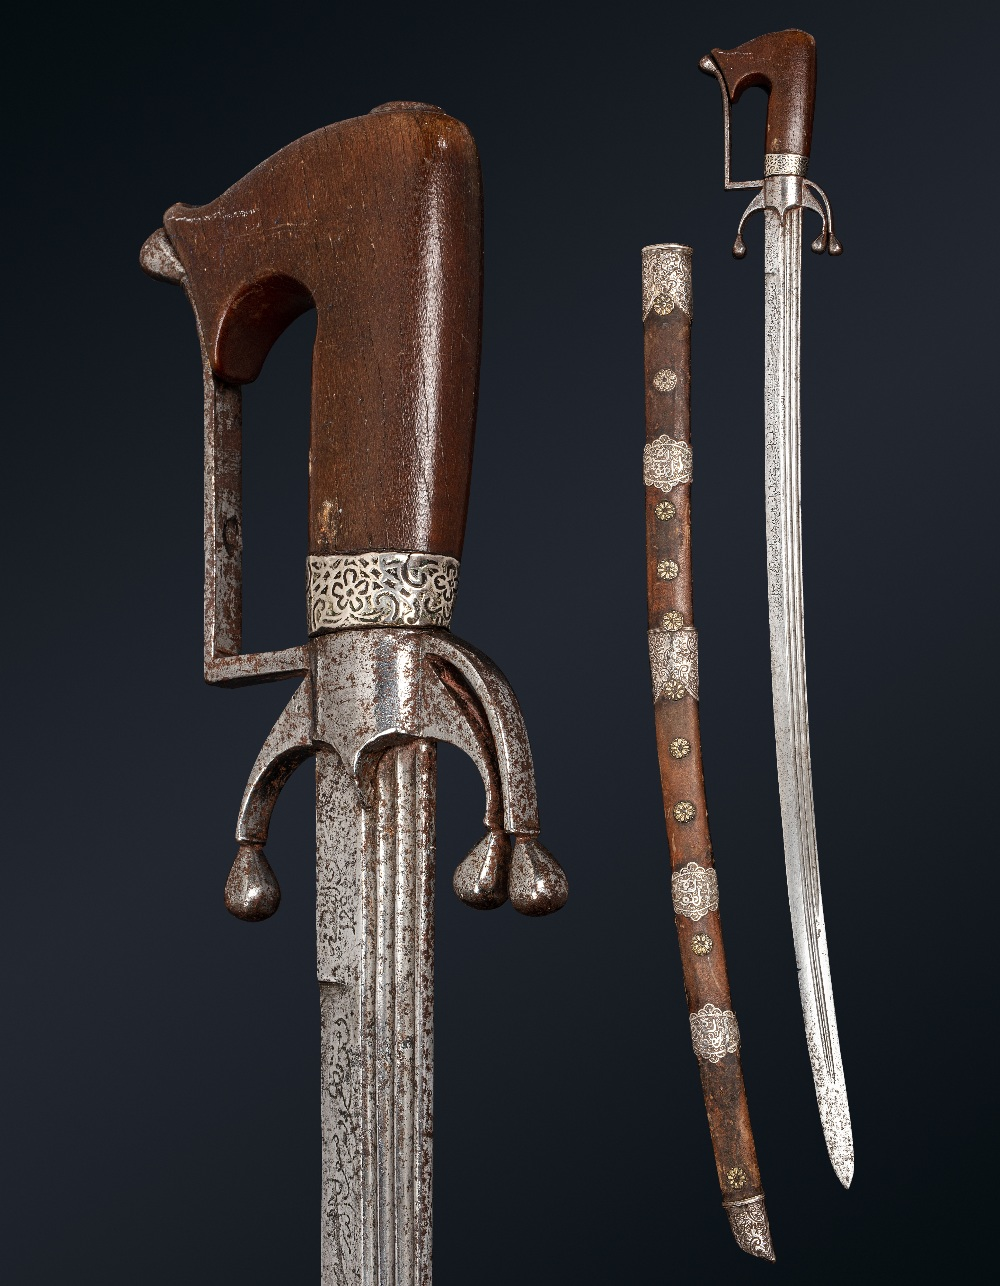 Superbe Nimcha signée Al-Baghdadi [al-Sabrawy ?]Maroc, datée 1224H . (=1808)Epée à poignée en